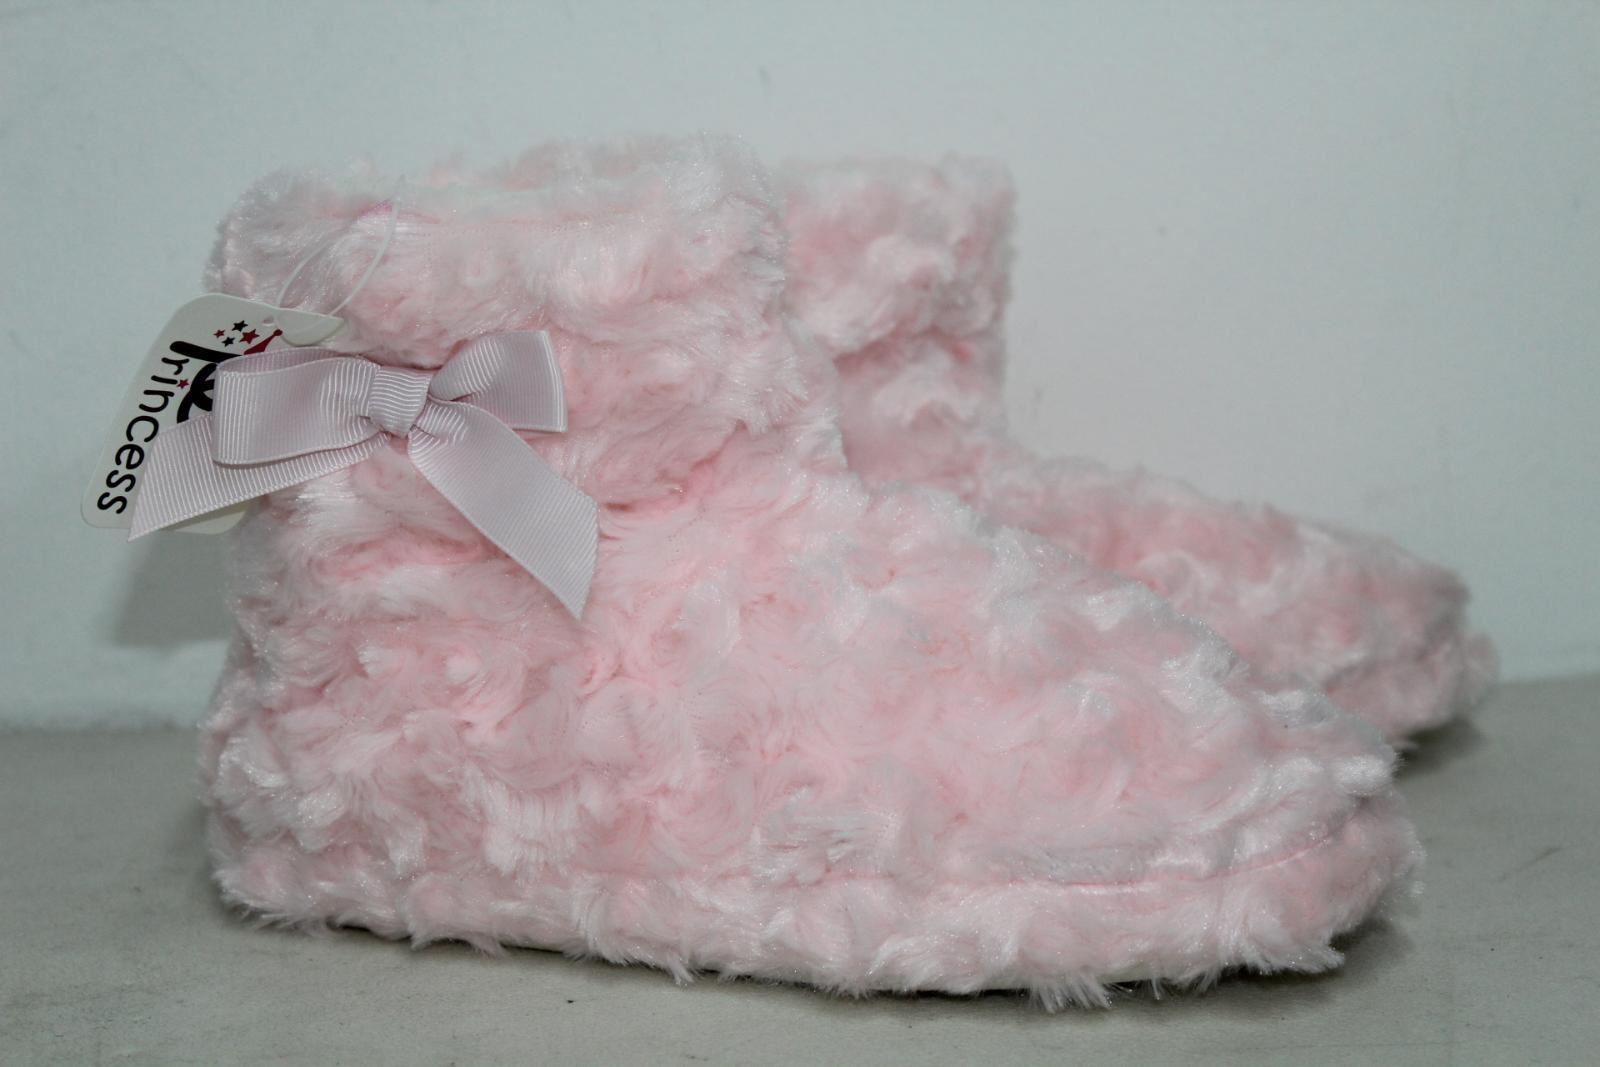 CHIC PRINCESS Girls Pink Fluffy Winter Warm Slipper Shoe Boots UK5 EU38 BNWT